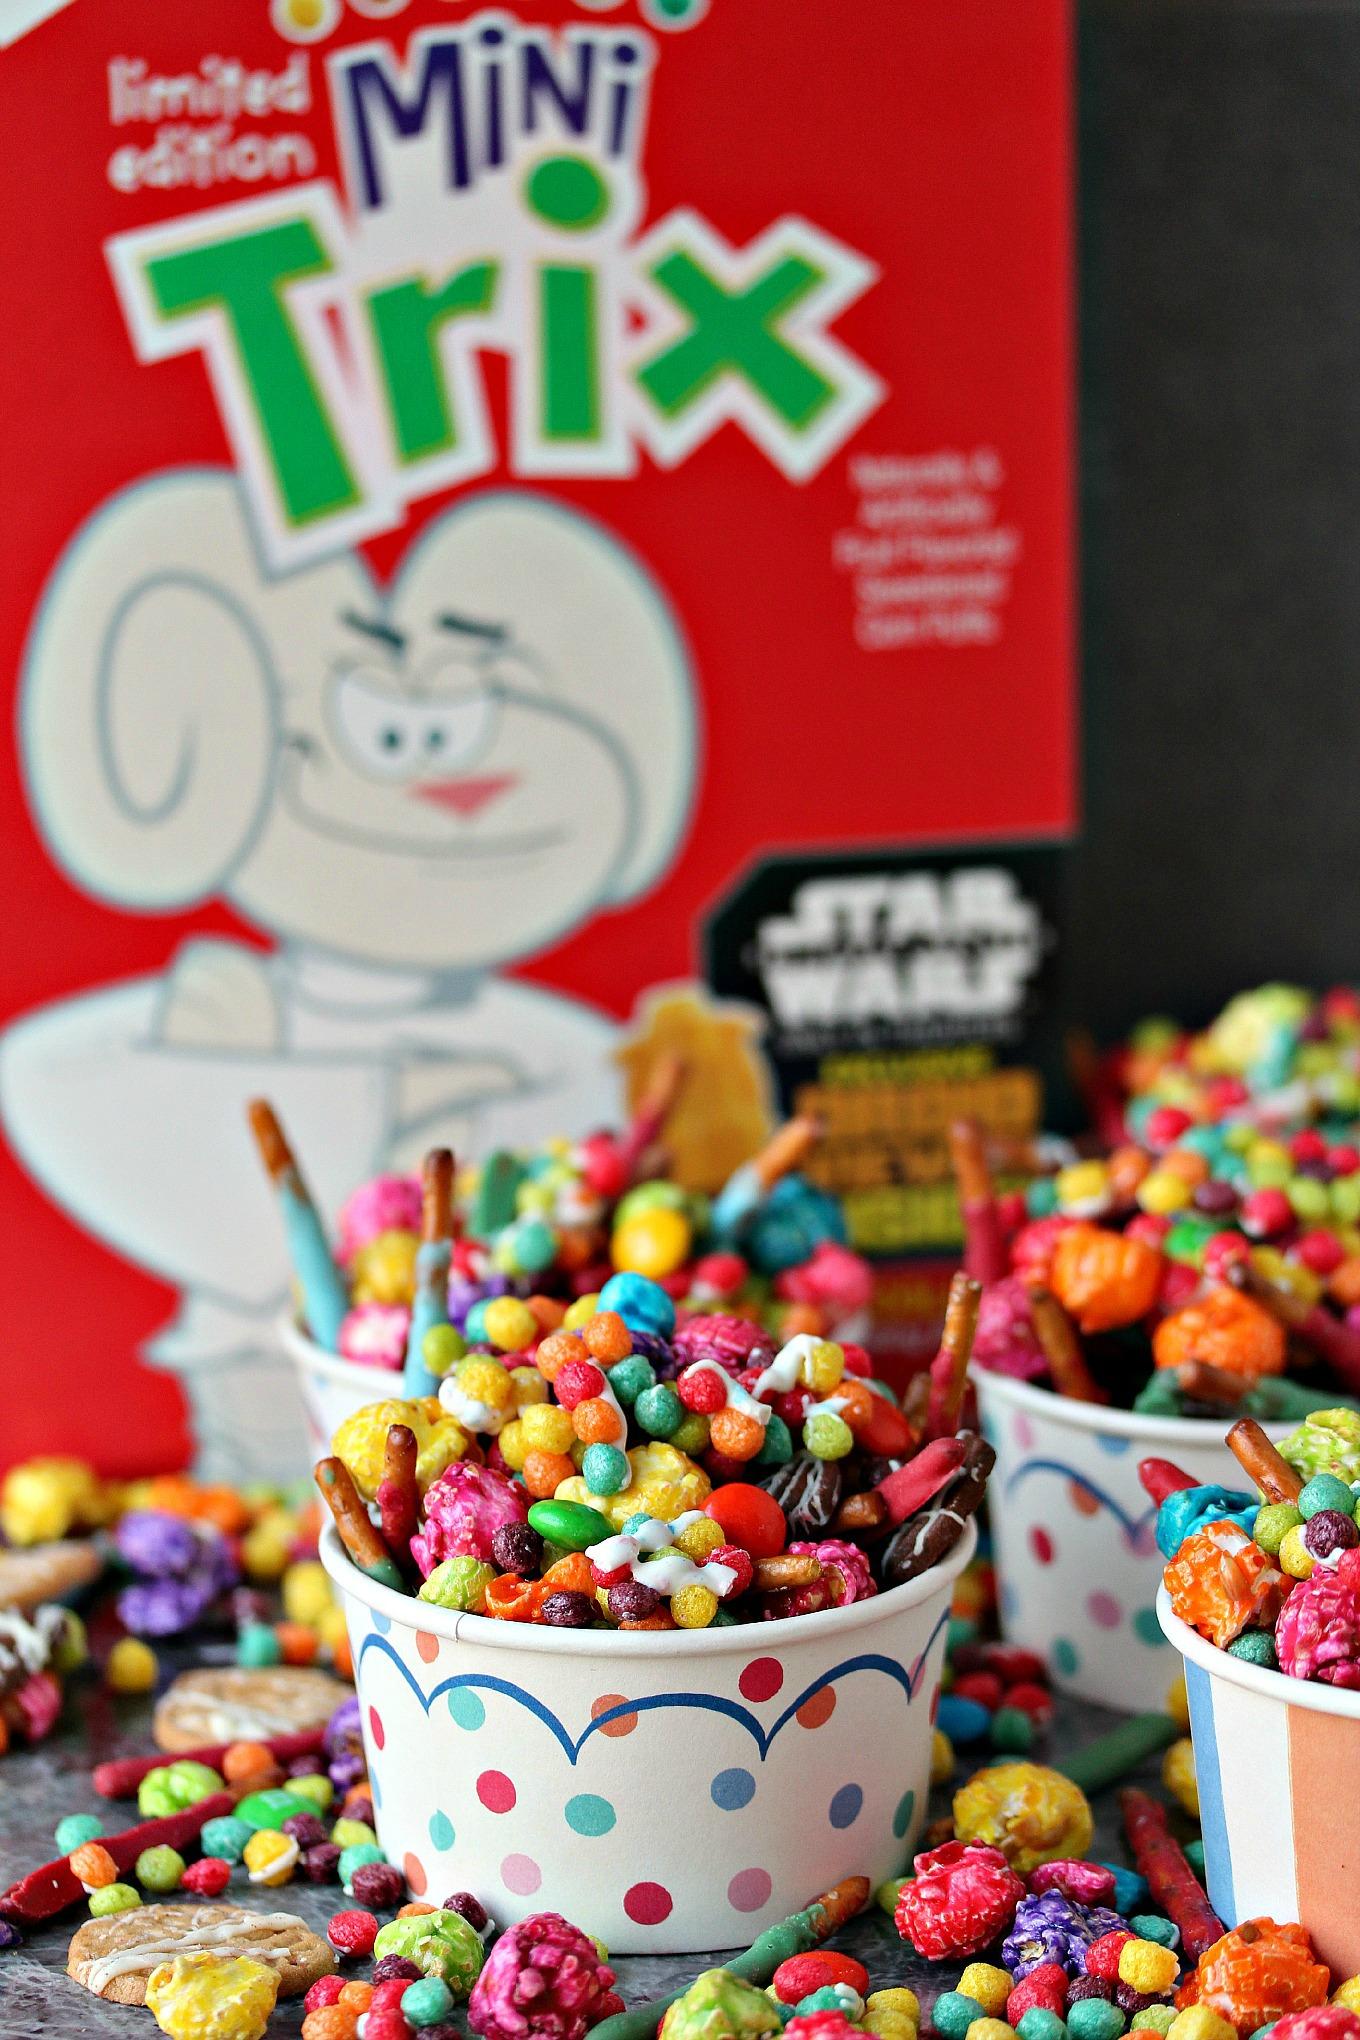 Mini Trix Cereal Jedi Snack Mix With Lightsaber Pretzels